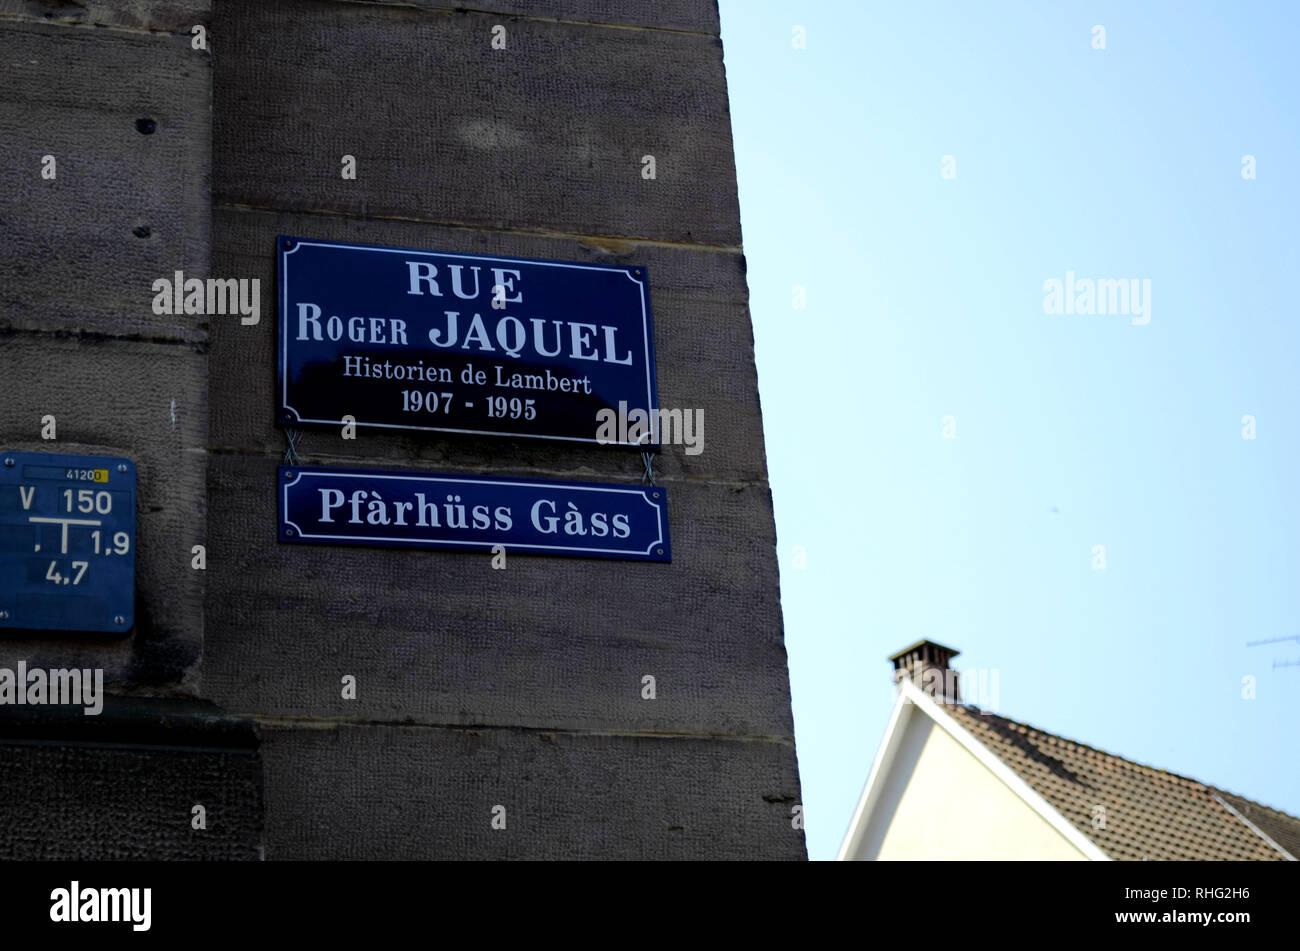 Rue Roger Jaquel street sign at Place Lambert in Mulhouse, France; Jaquel was the biographer of mathematician Johan Heinrich Lambert. - Stock Image